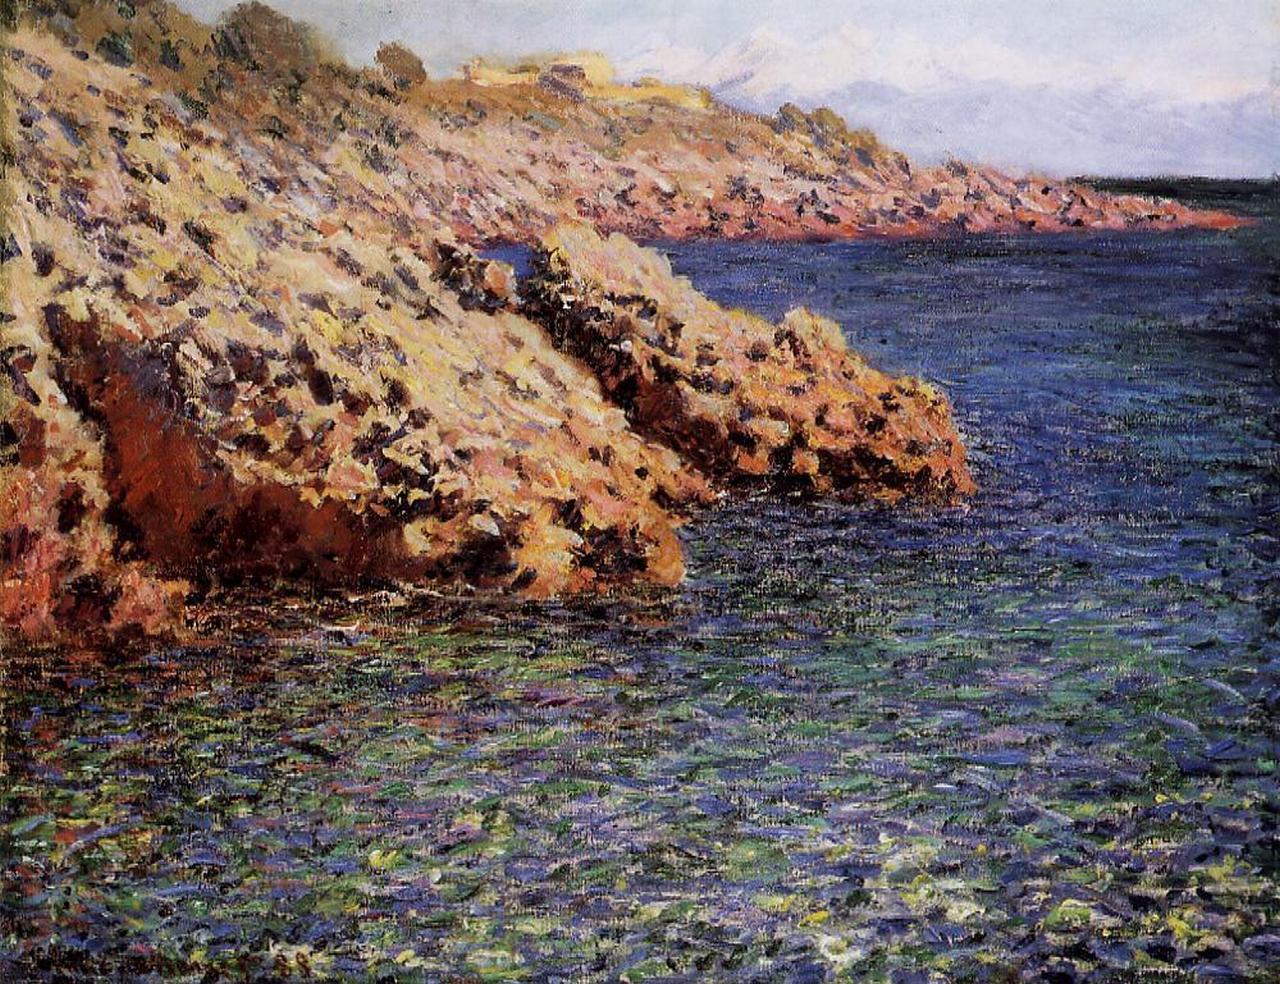 скалы и море < Камни на берегу Средиземного моря>:: Клод Моне, описание картины - Моне Клод (Claude Monet) фото